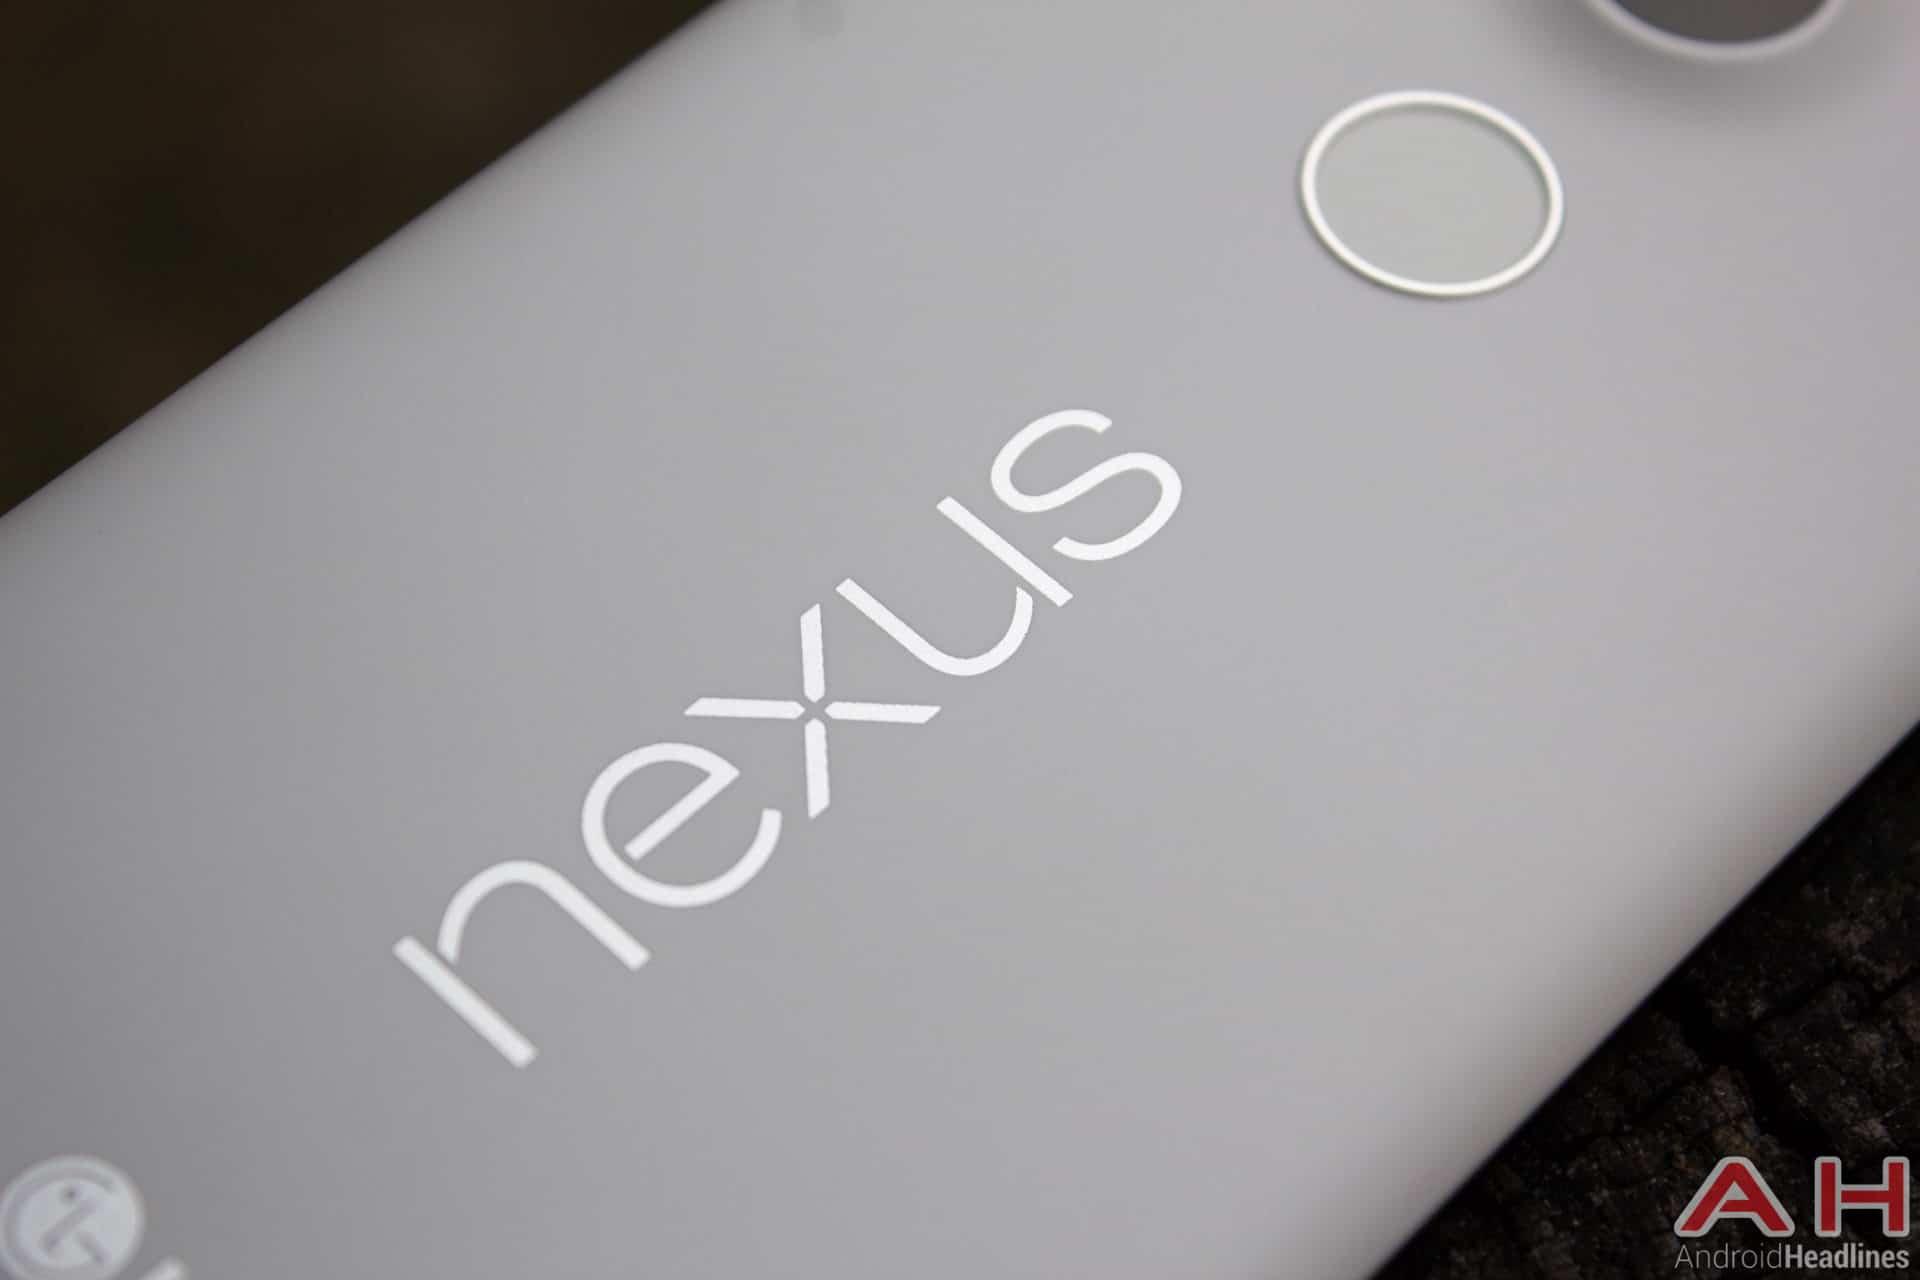 Nexus 5x AH logo 1